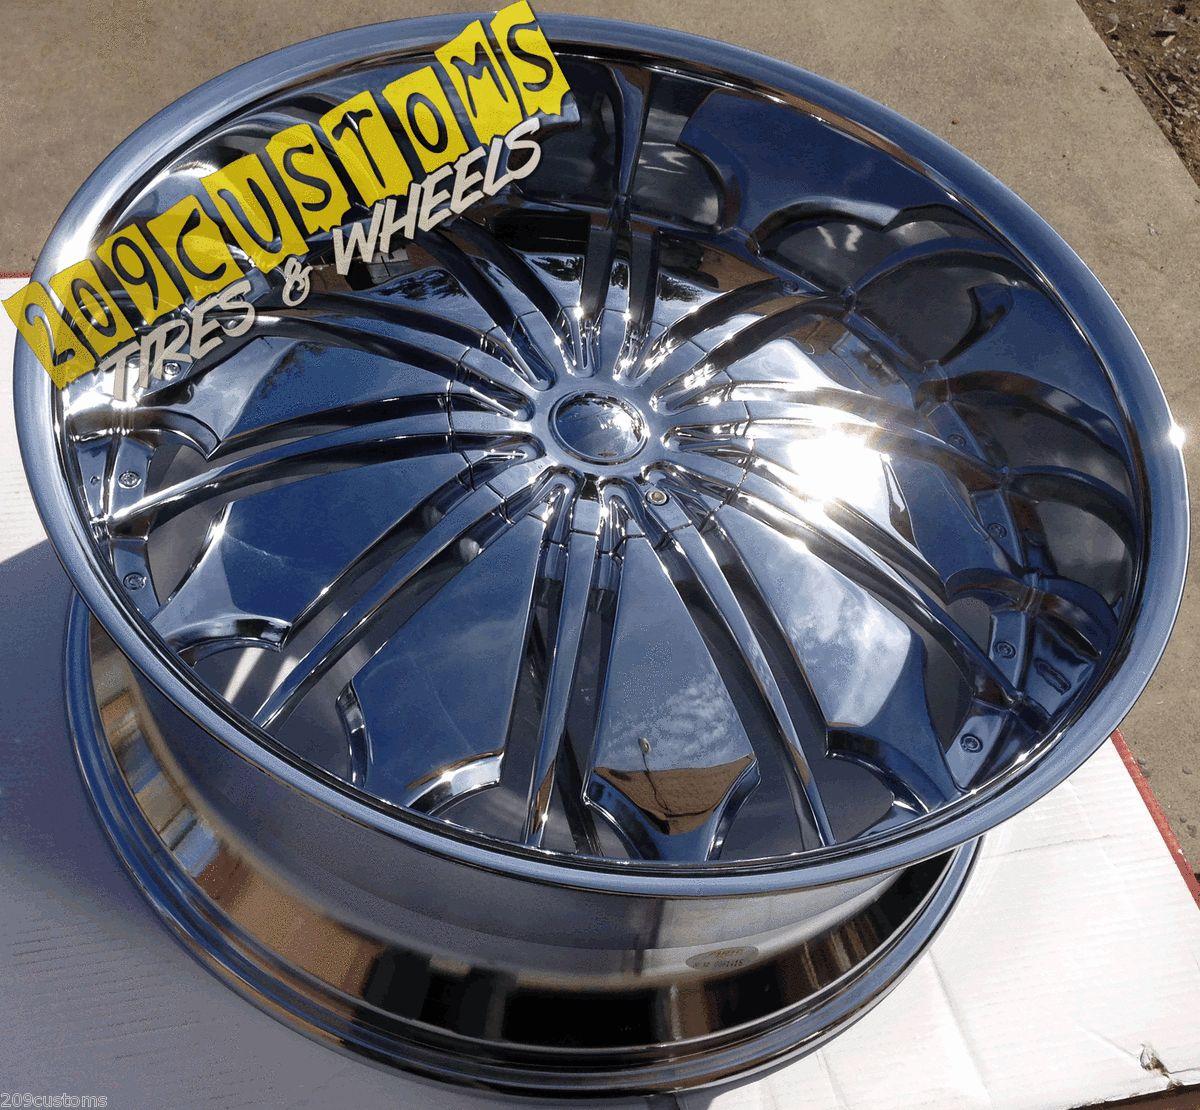 28 TW706 Wheels Rims Tires 6x139 7 Cadillac Escalade Wheels and Tires